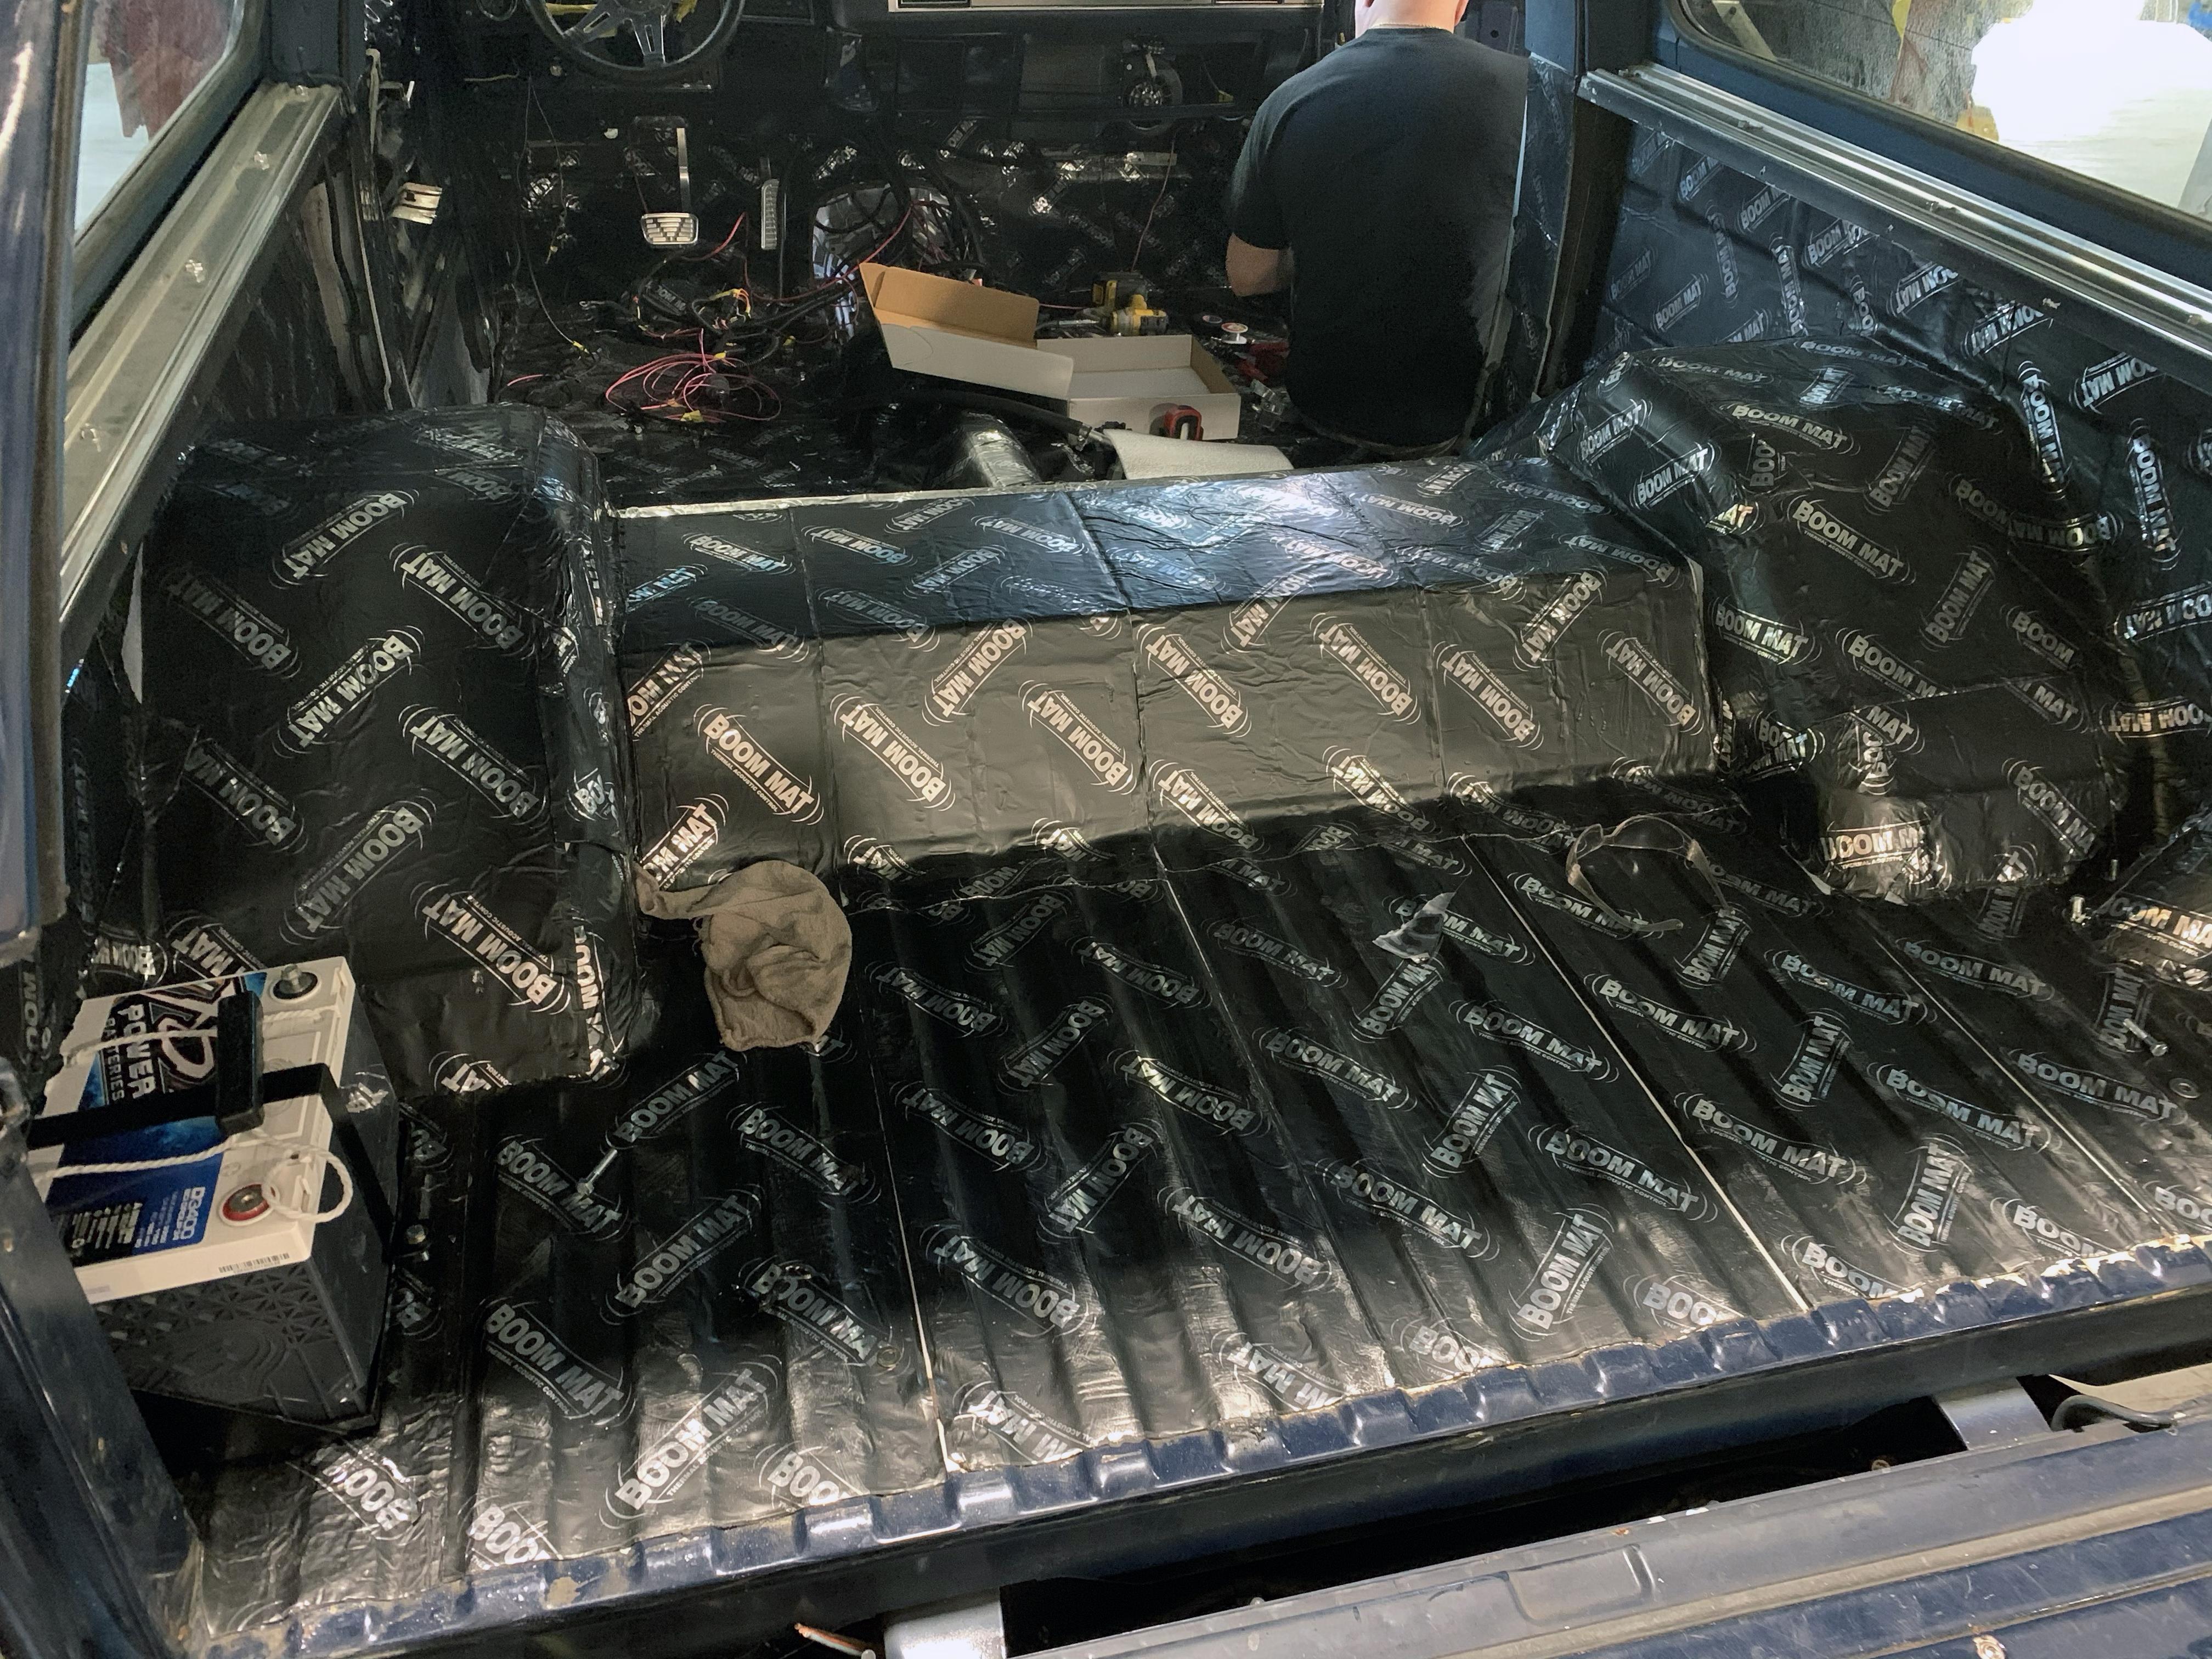 Scotts-Hotrods-82-C10-Blazer-2WD-11